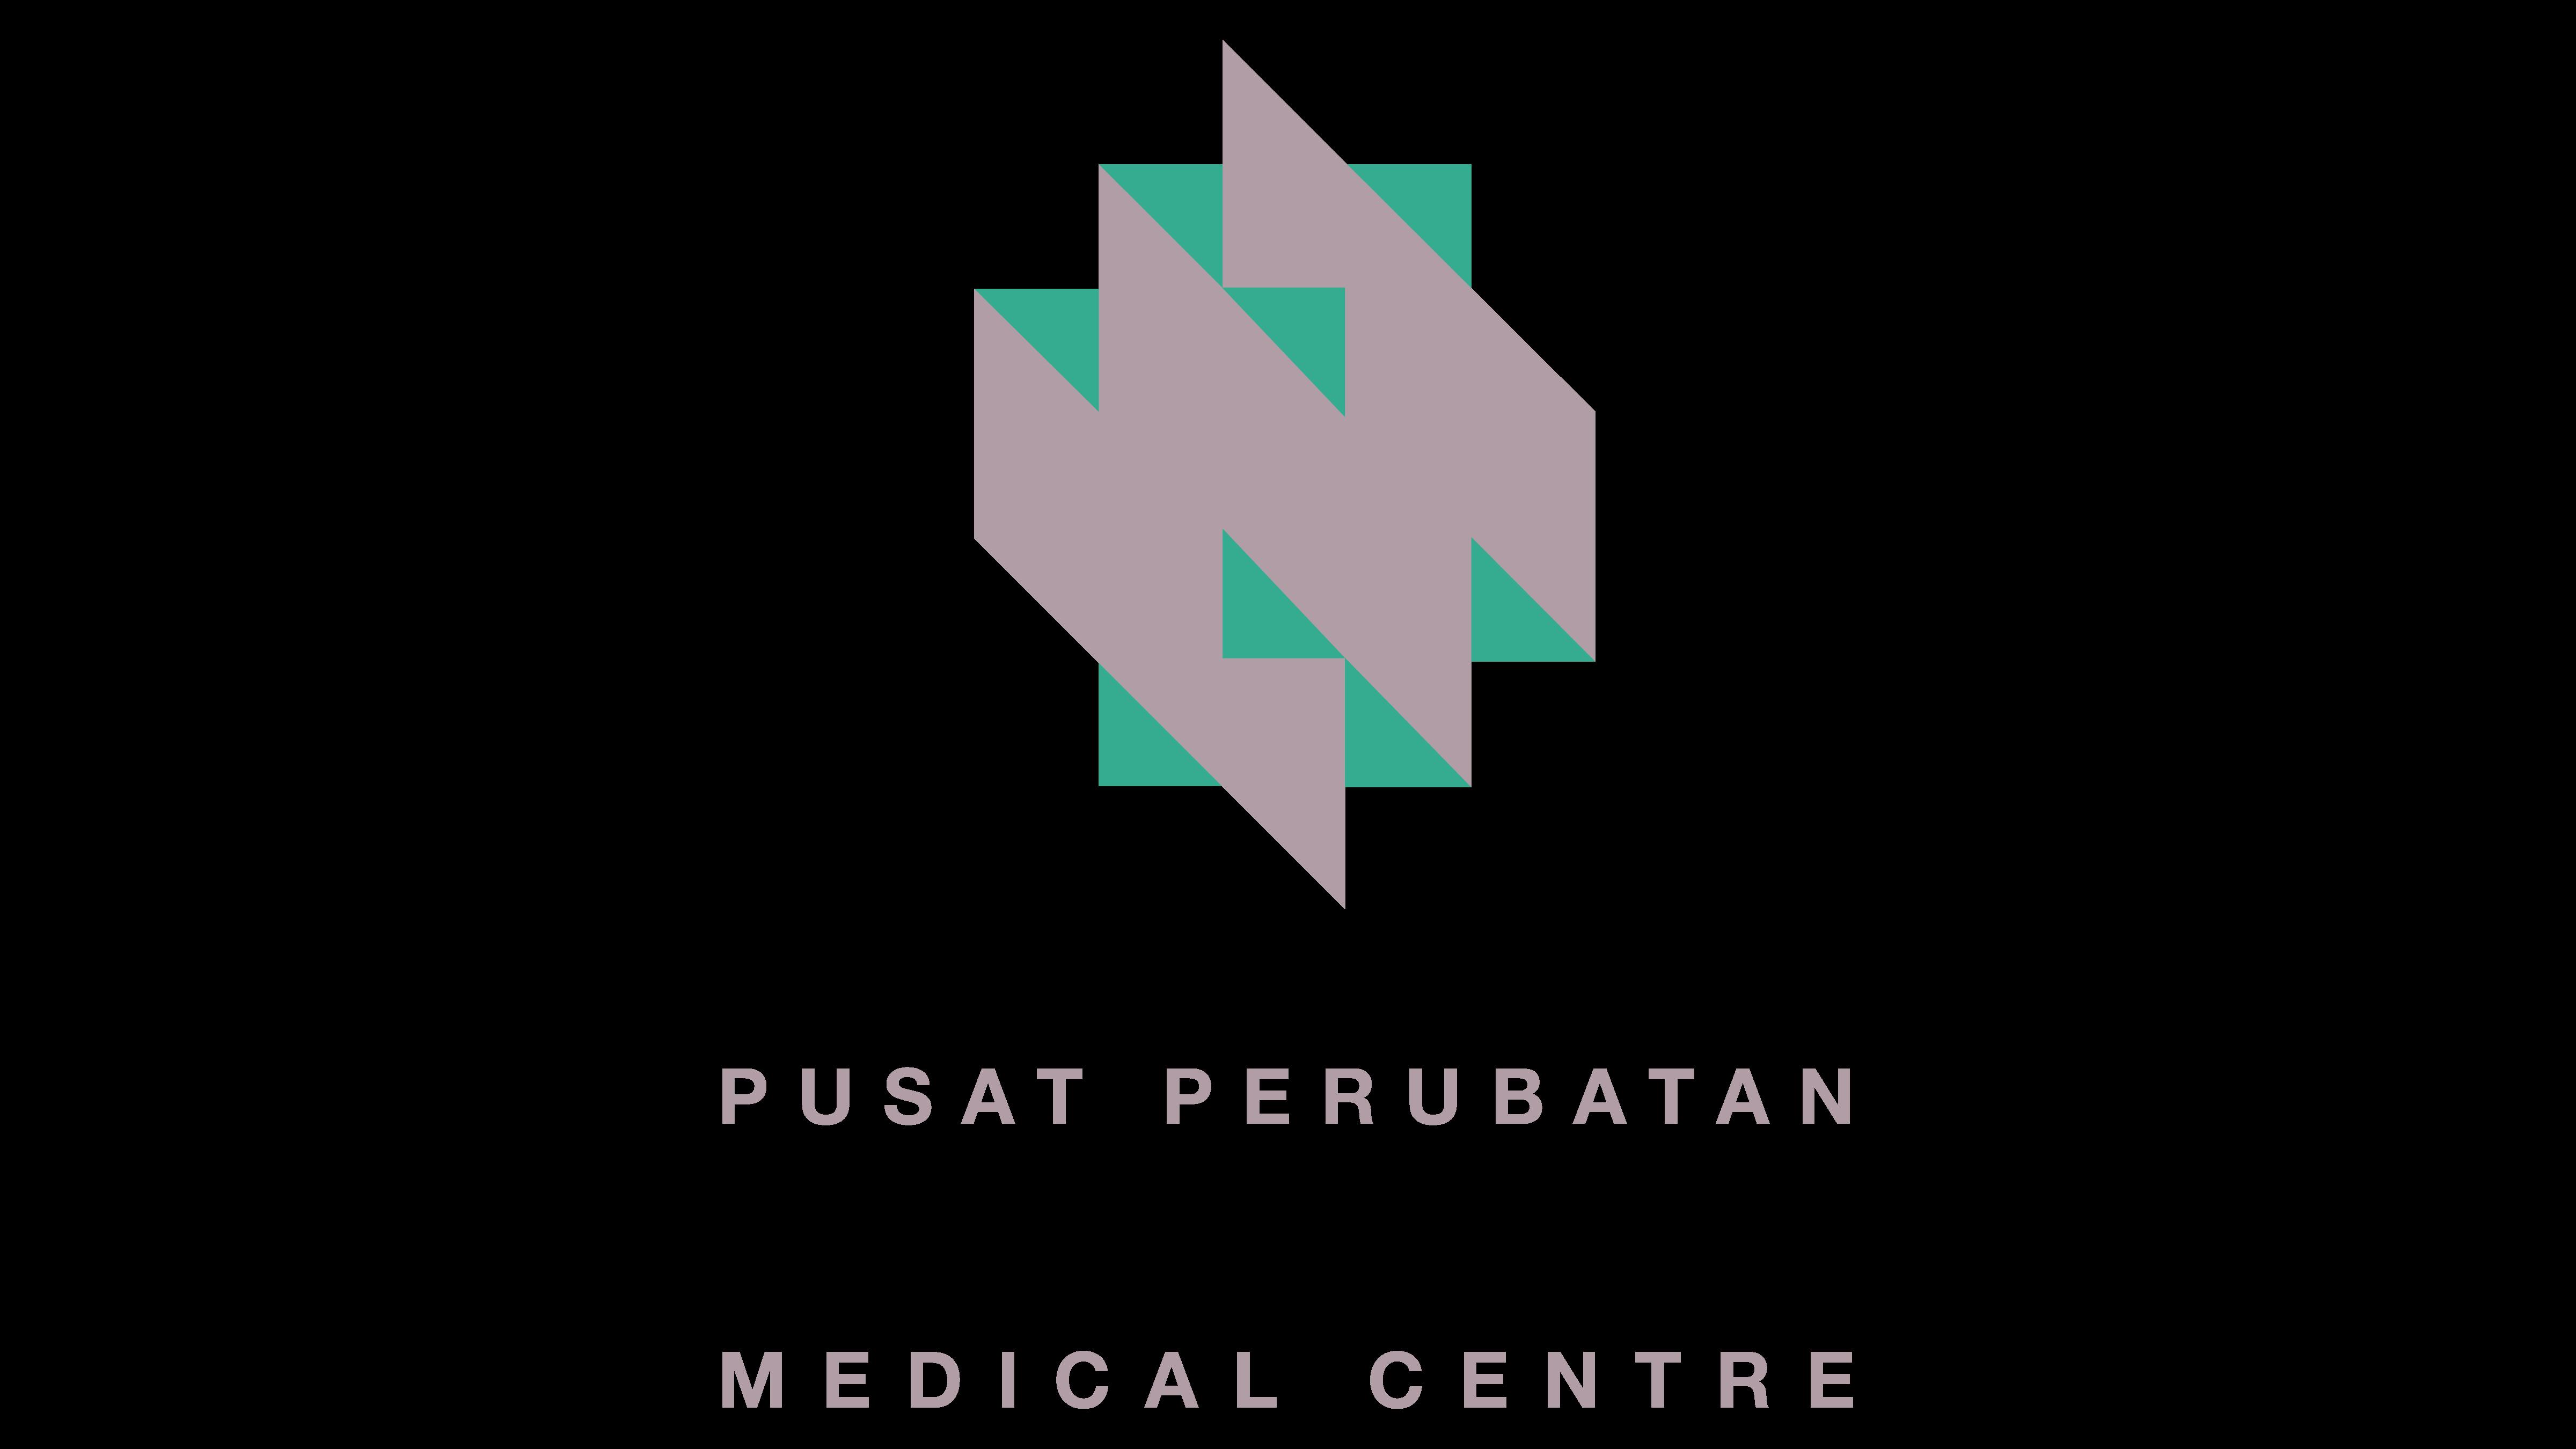 Prince Court Medical Centre